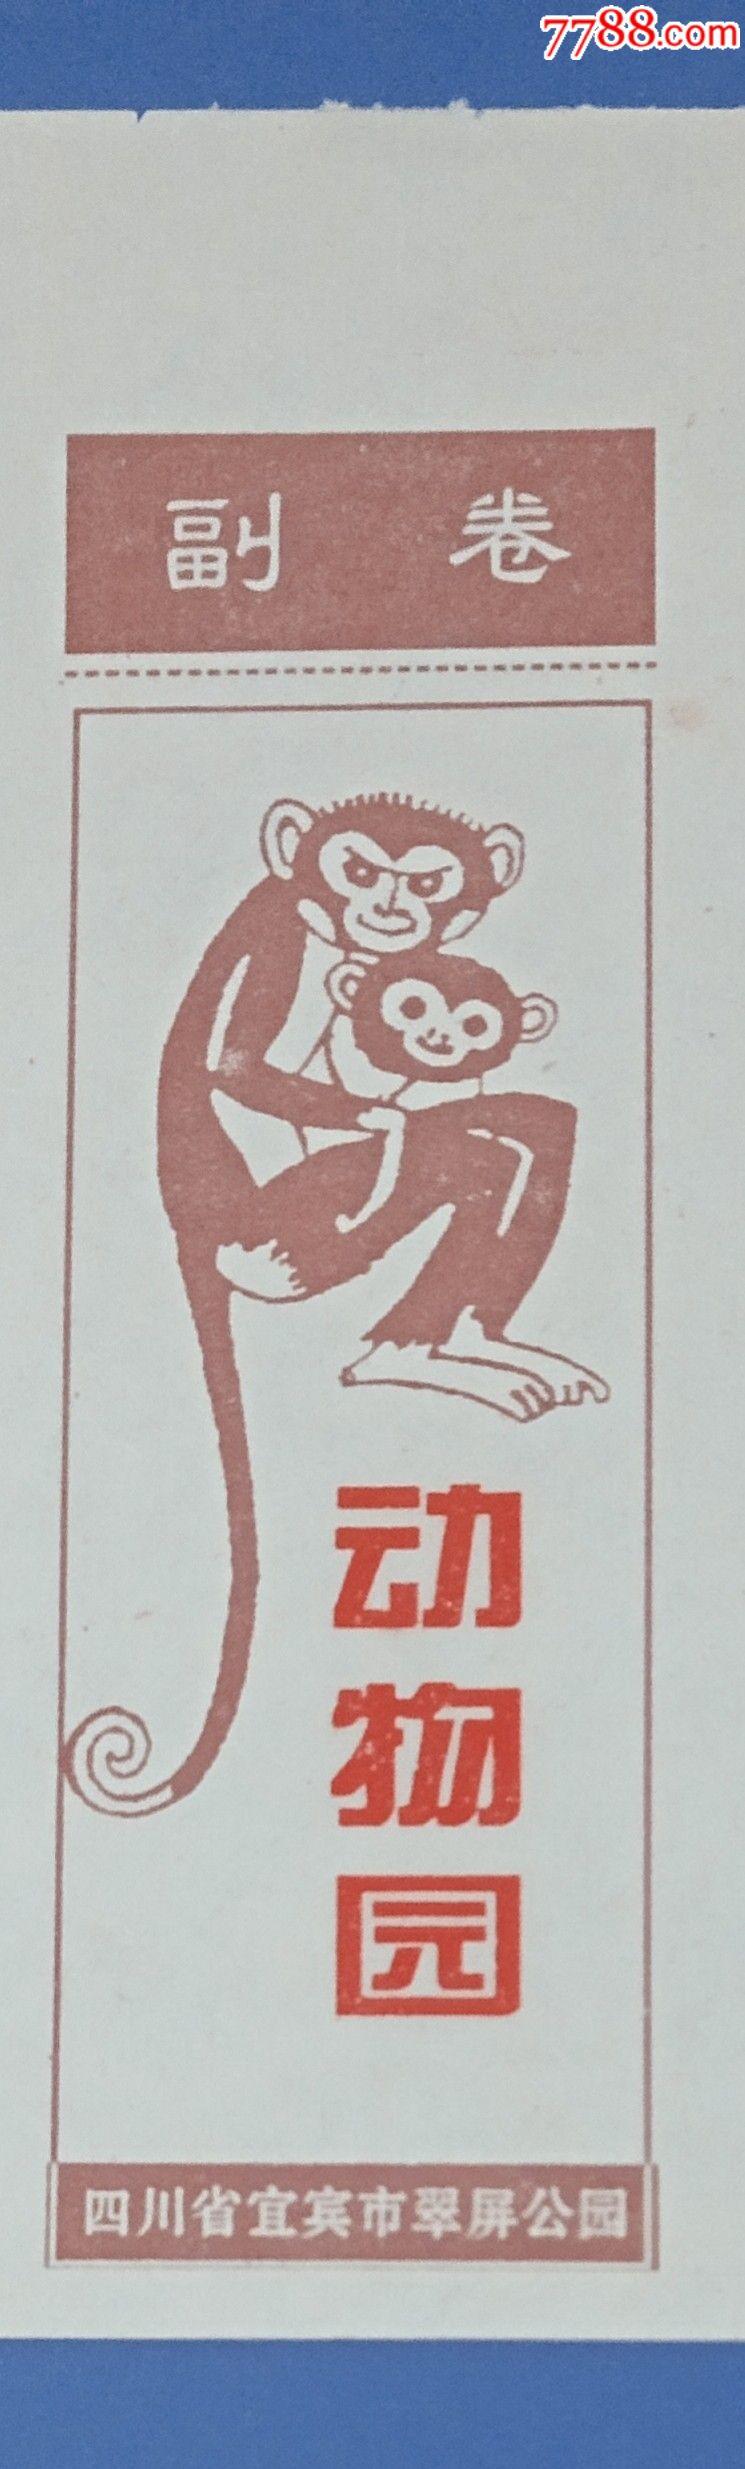 四川宜宾动物园